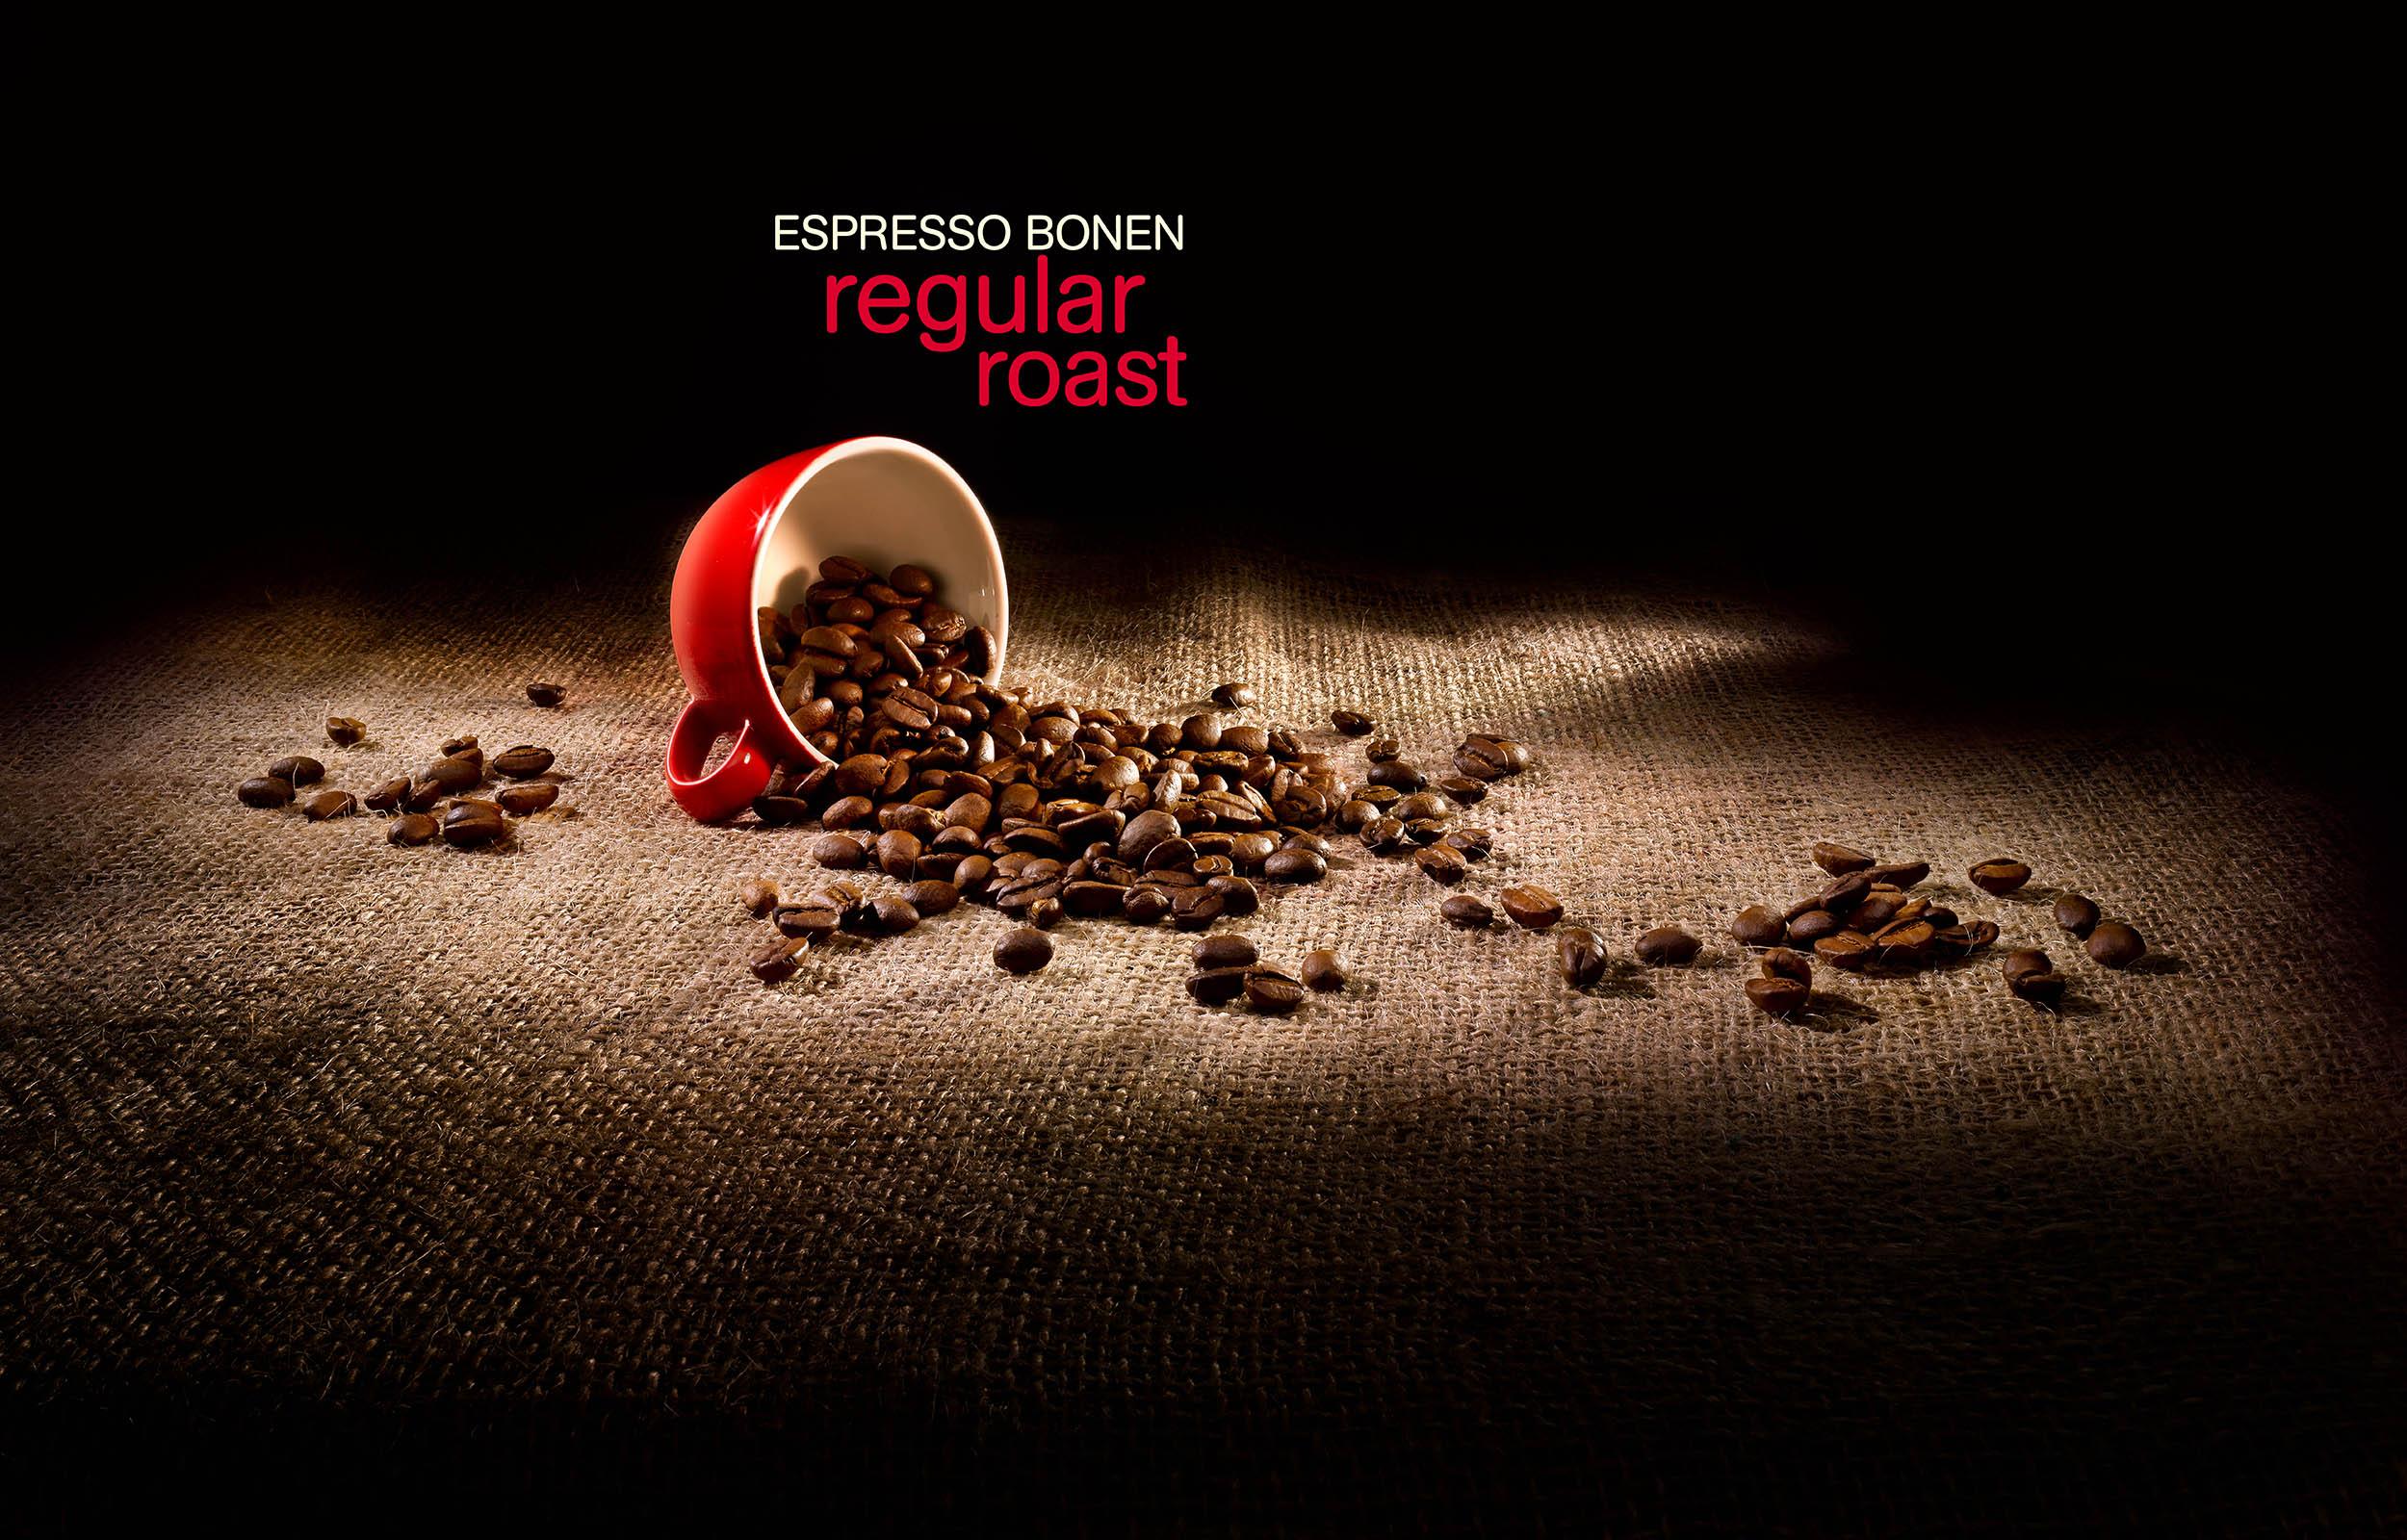 https://crisp.cc/wp-content/uploads/2018/11/1000g-Coffee-beans.jpg